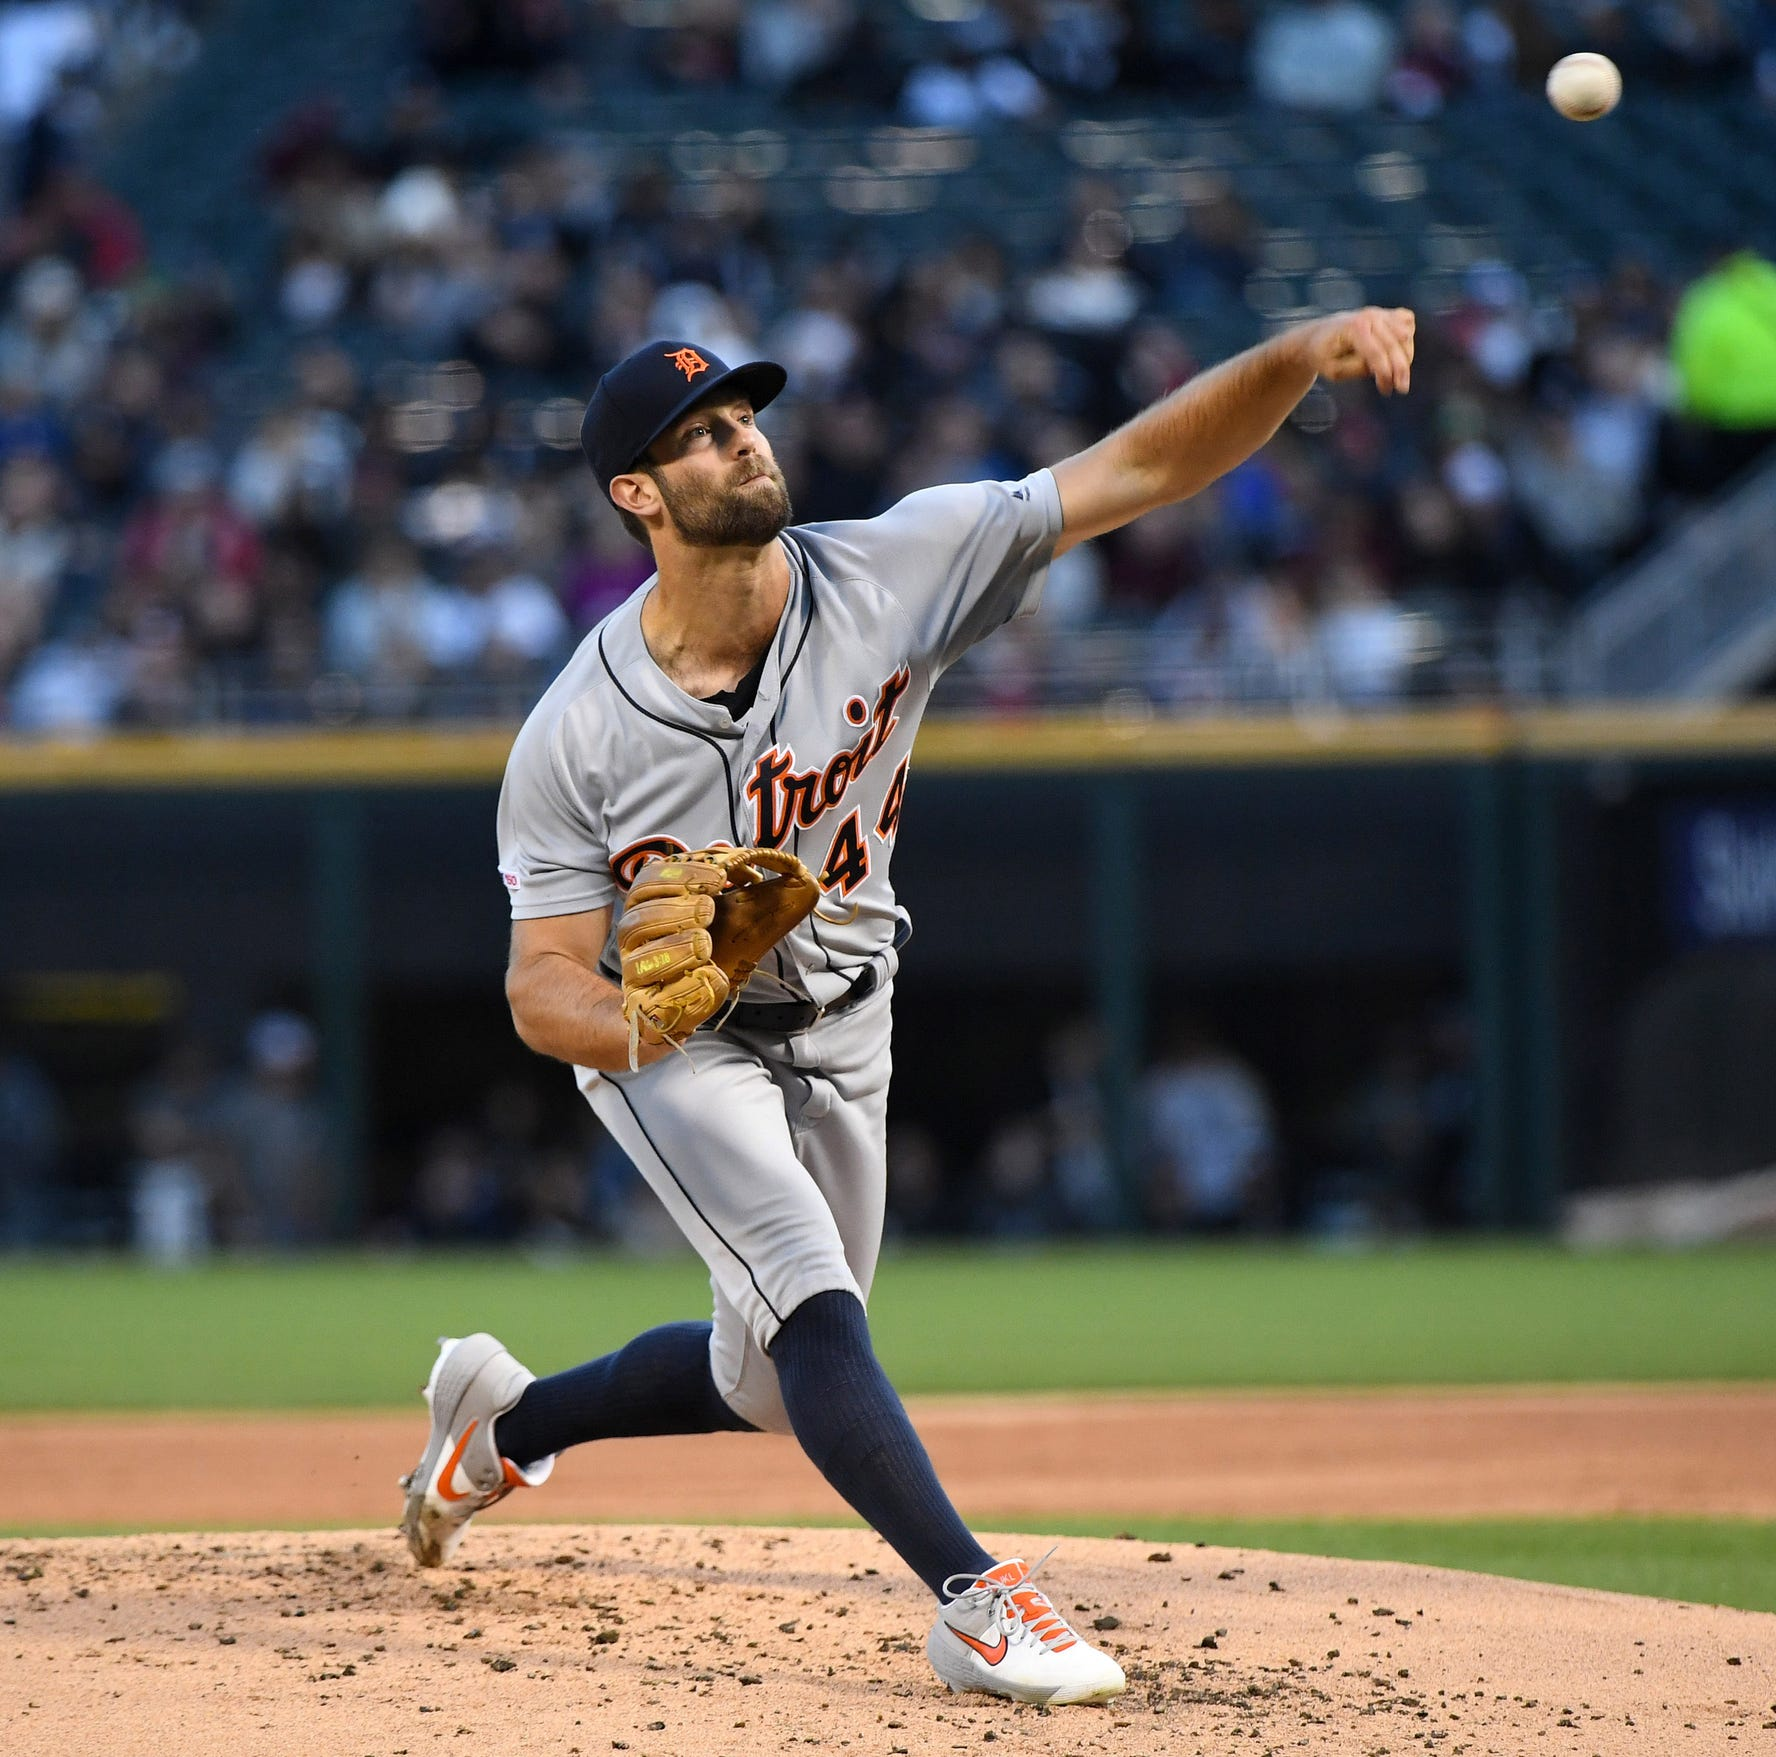 Game recap: Detroit Tigers fall to Philadelphia Phillies, 7-3